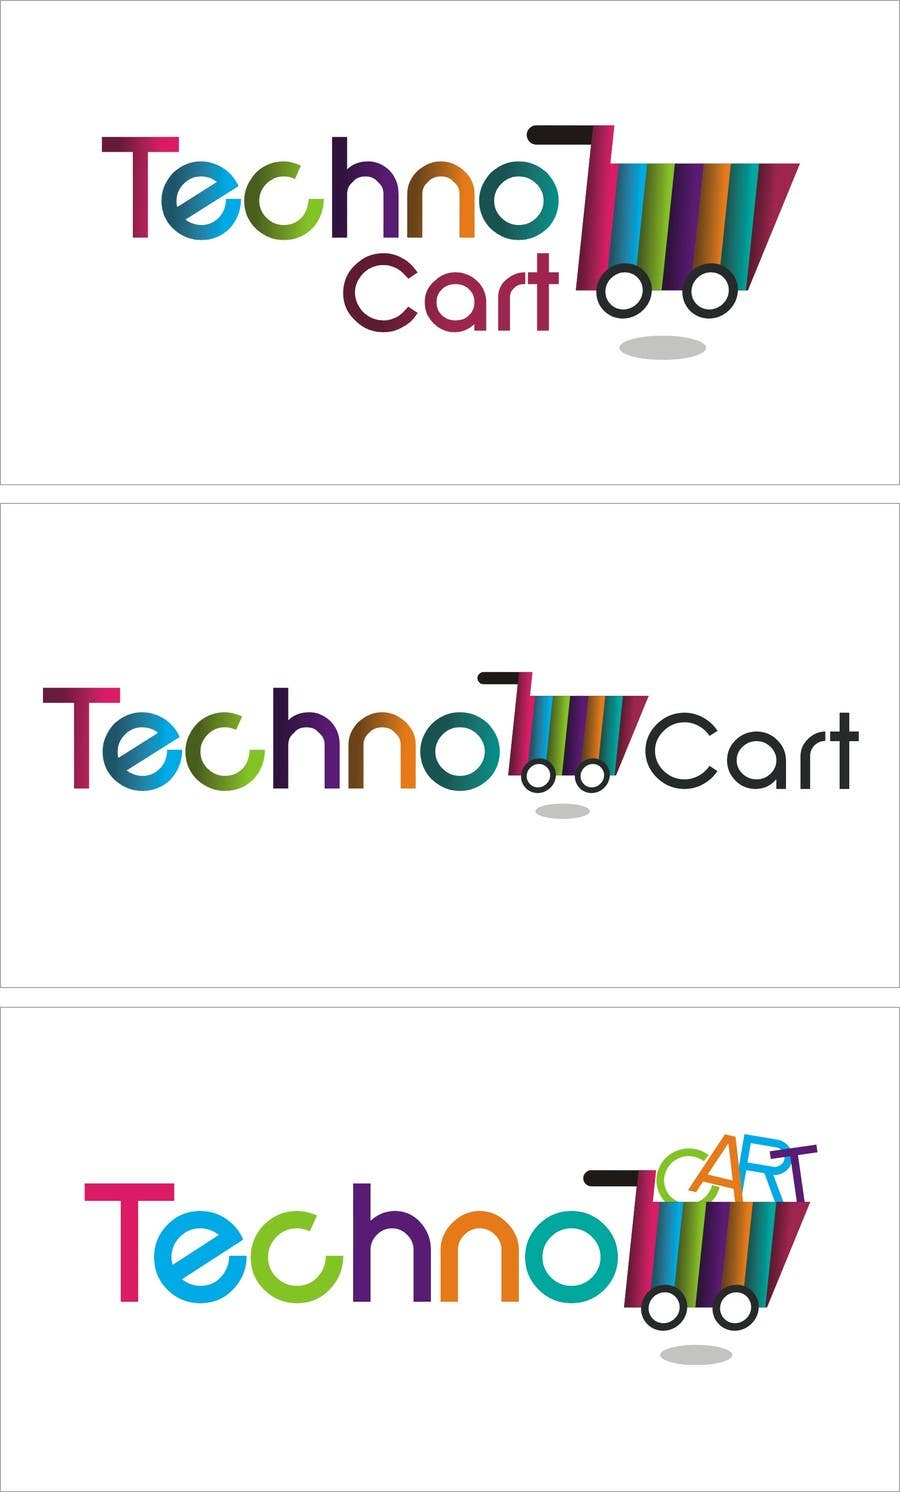 Kilpailutyö #45 kilpailussa Design a Logo for TechnoCart.co.uk